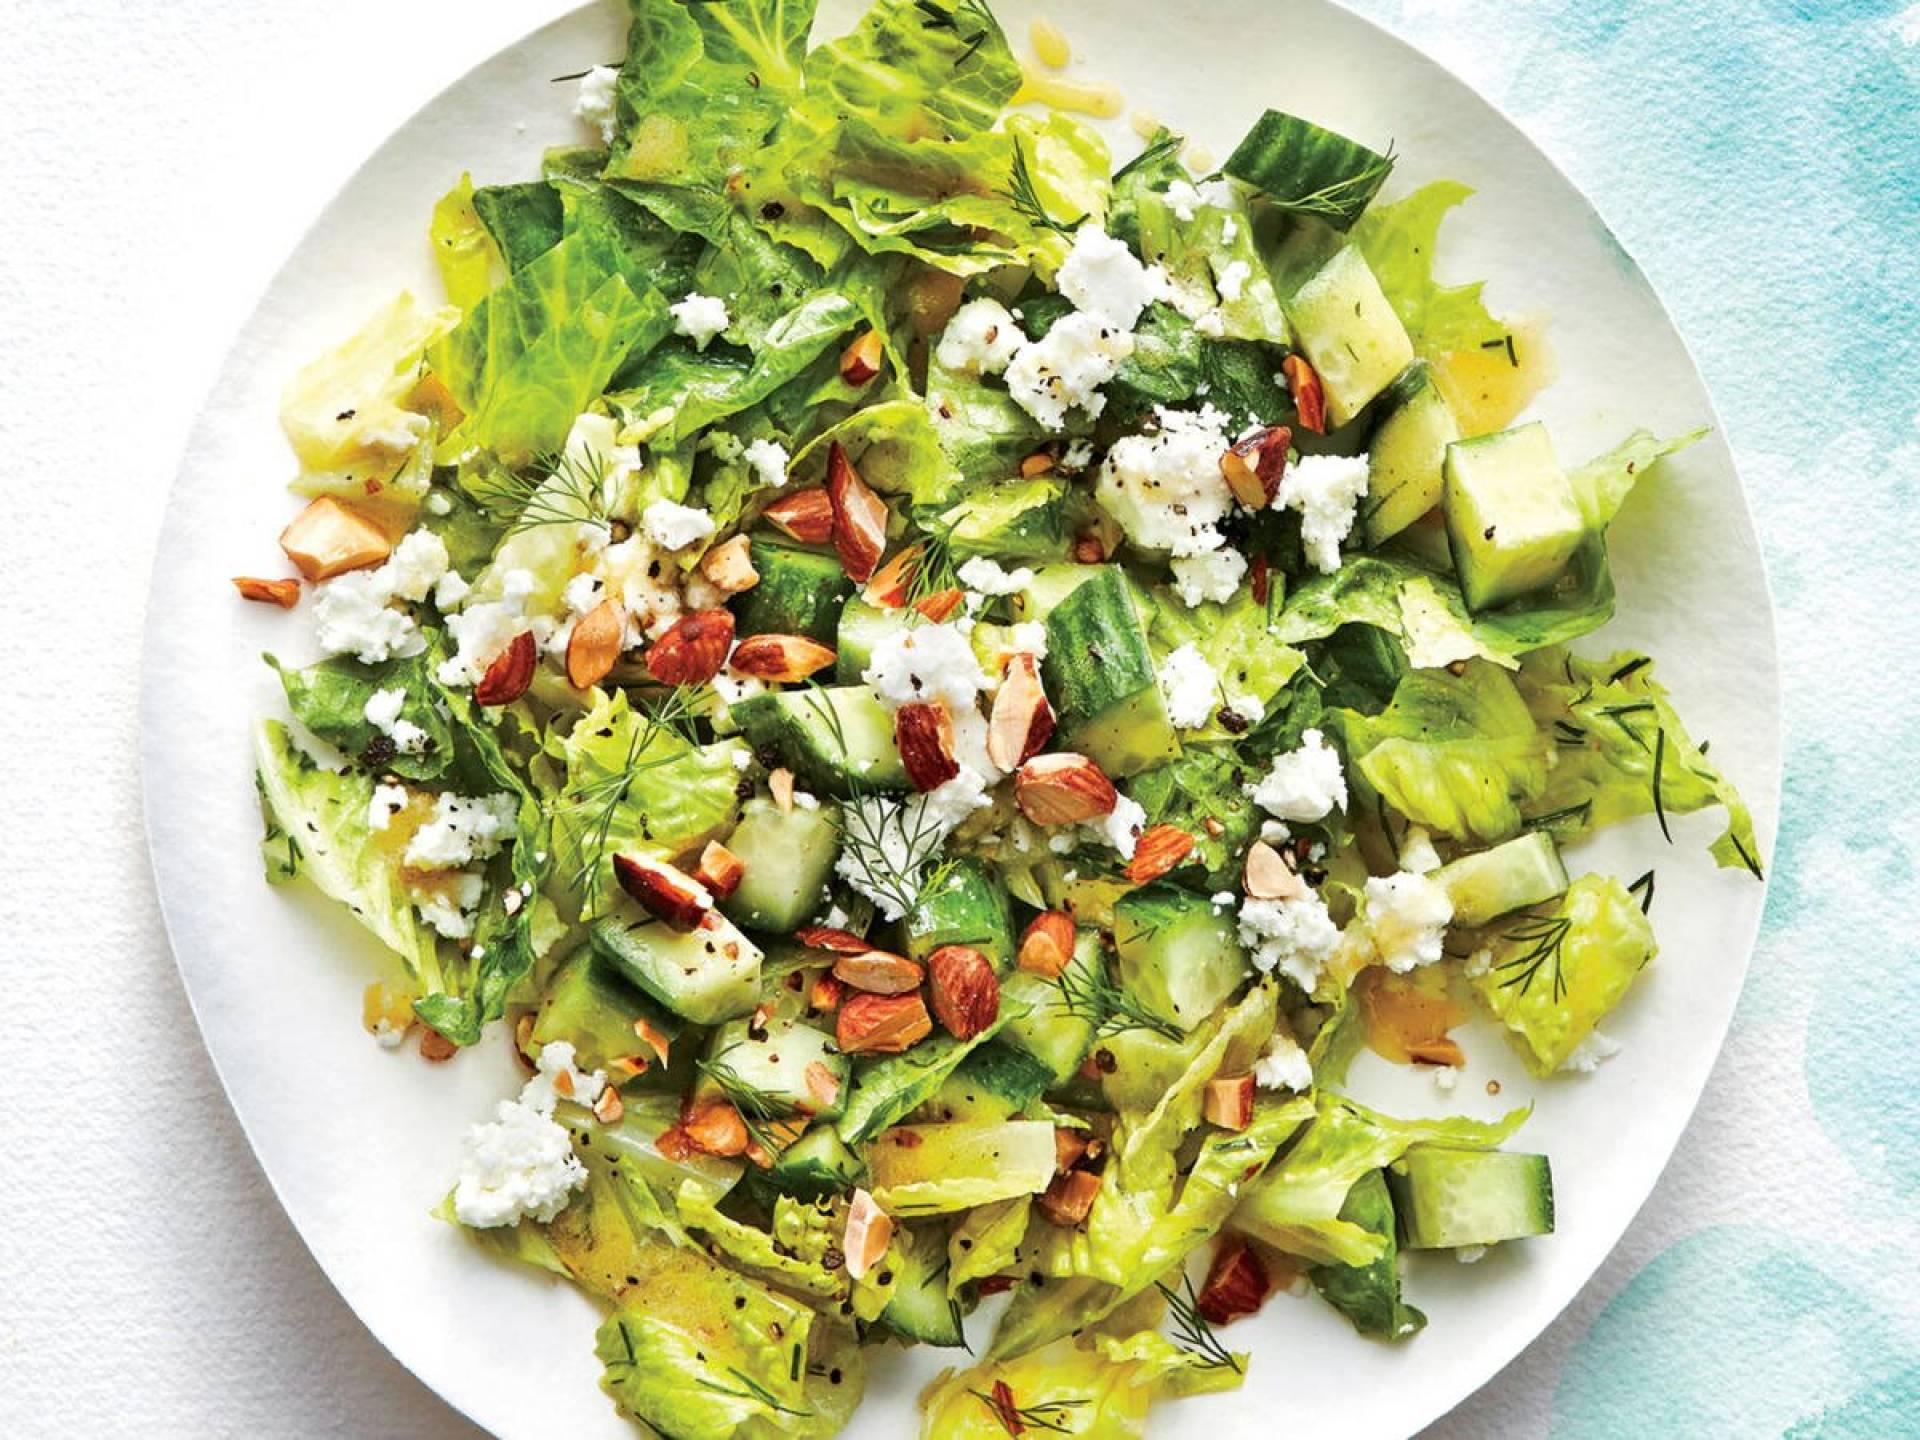 Crunchy Romaine Salad with Prawns